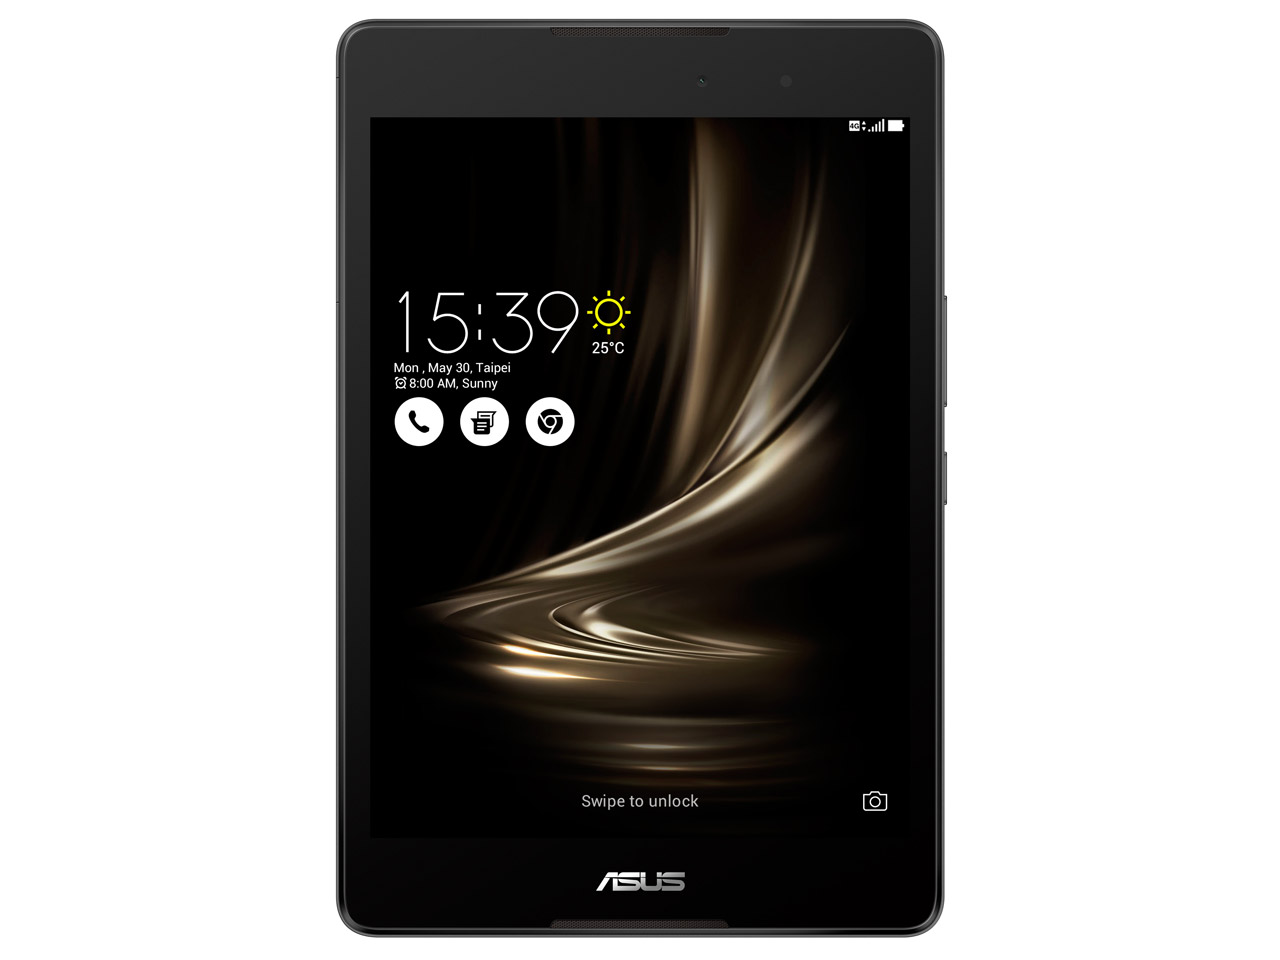 ASUS 移動通信対応タブレット ASUS ZenPad 3 8.0 Z581KL-BK32S4 SIMフリー